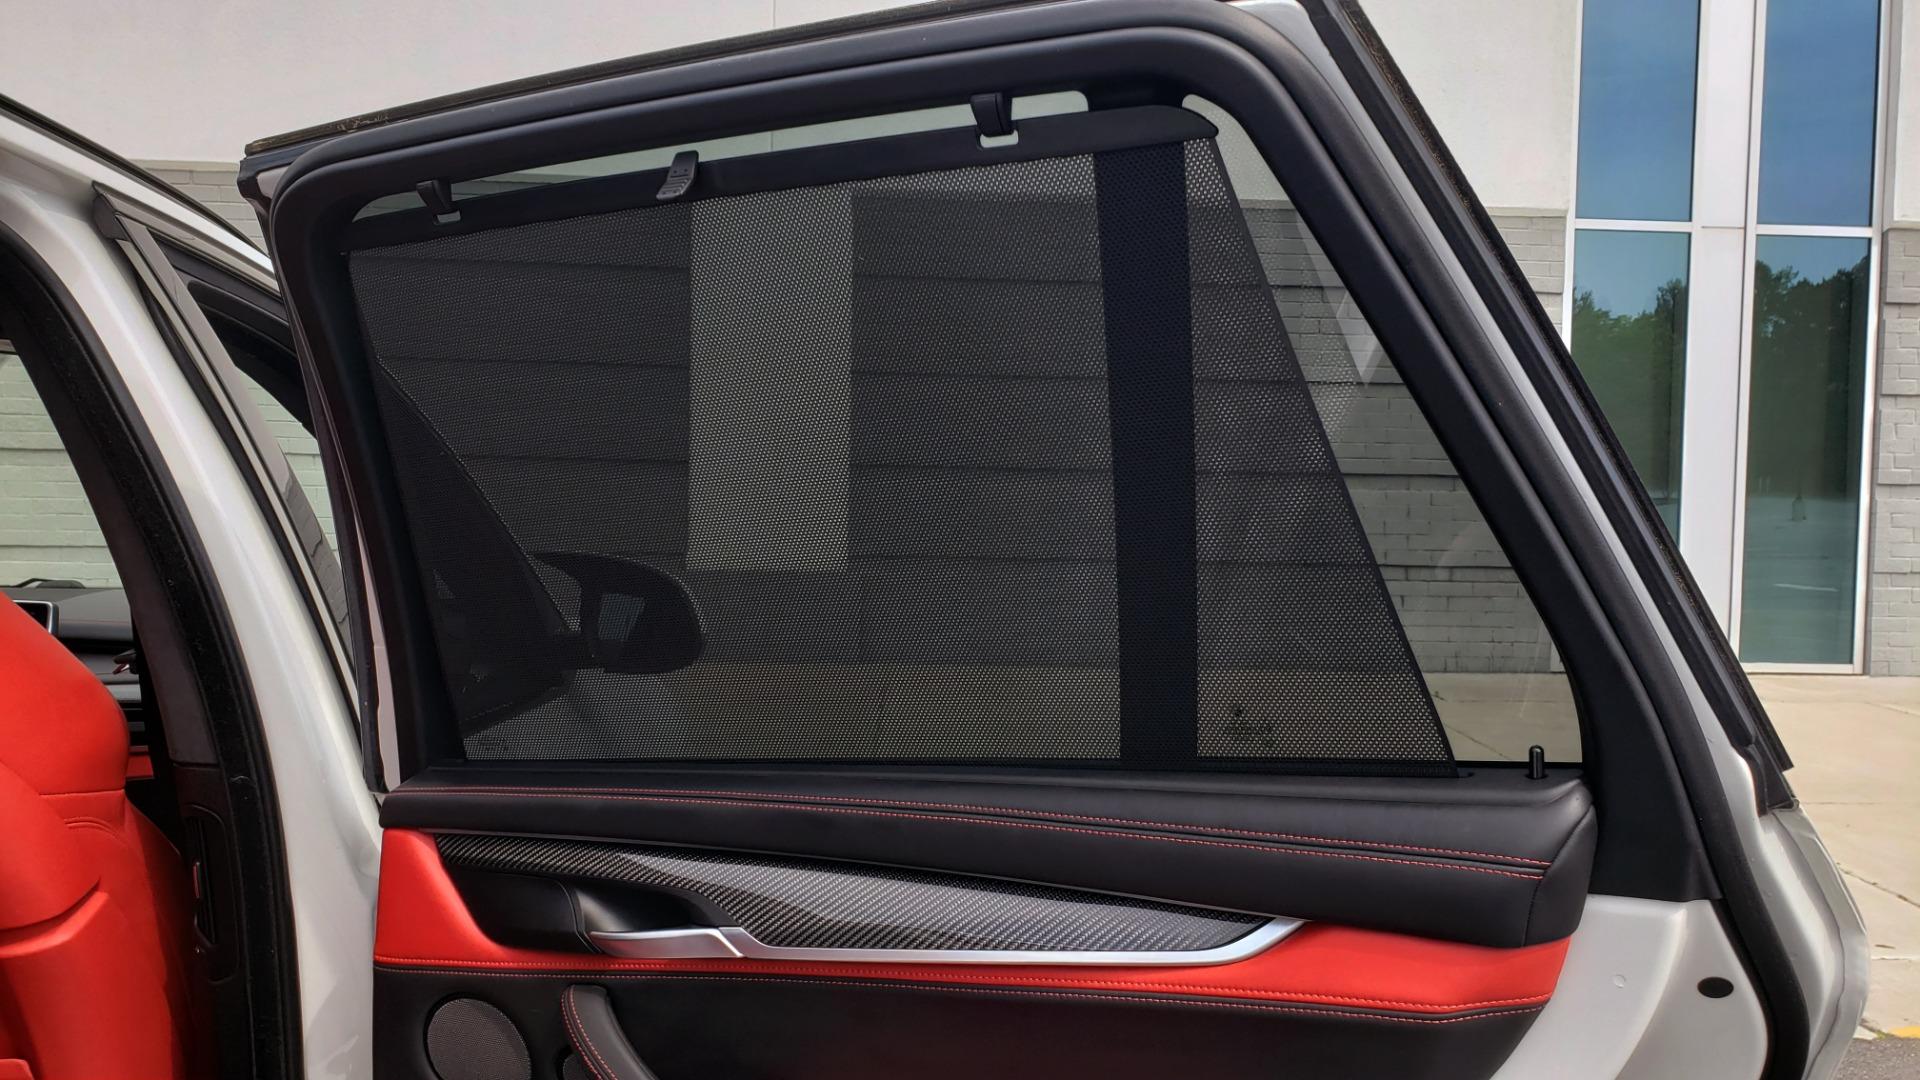 Used 2017 BMW X5 M EXECUTIVE PKG / NAV / DRVR ASST / BSM / HUD / HTD STS / WIFI for sale Sold at Formula Imports in Charlotte NC 28227 75